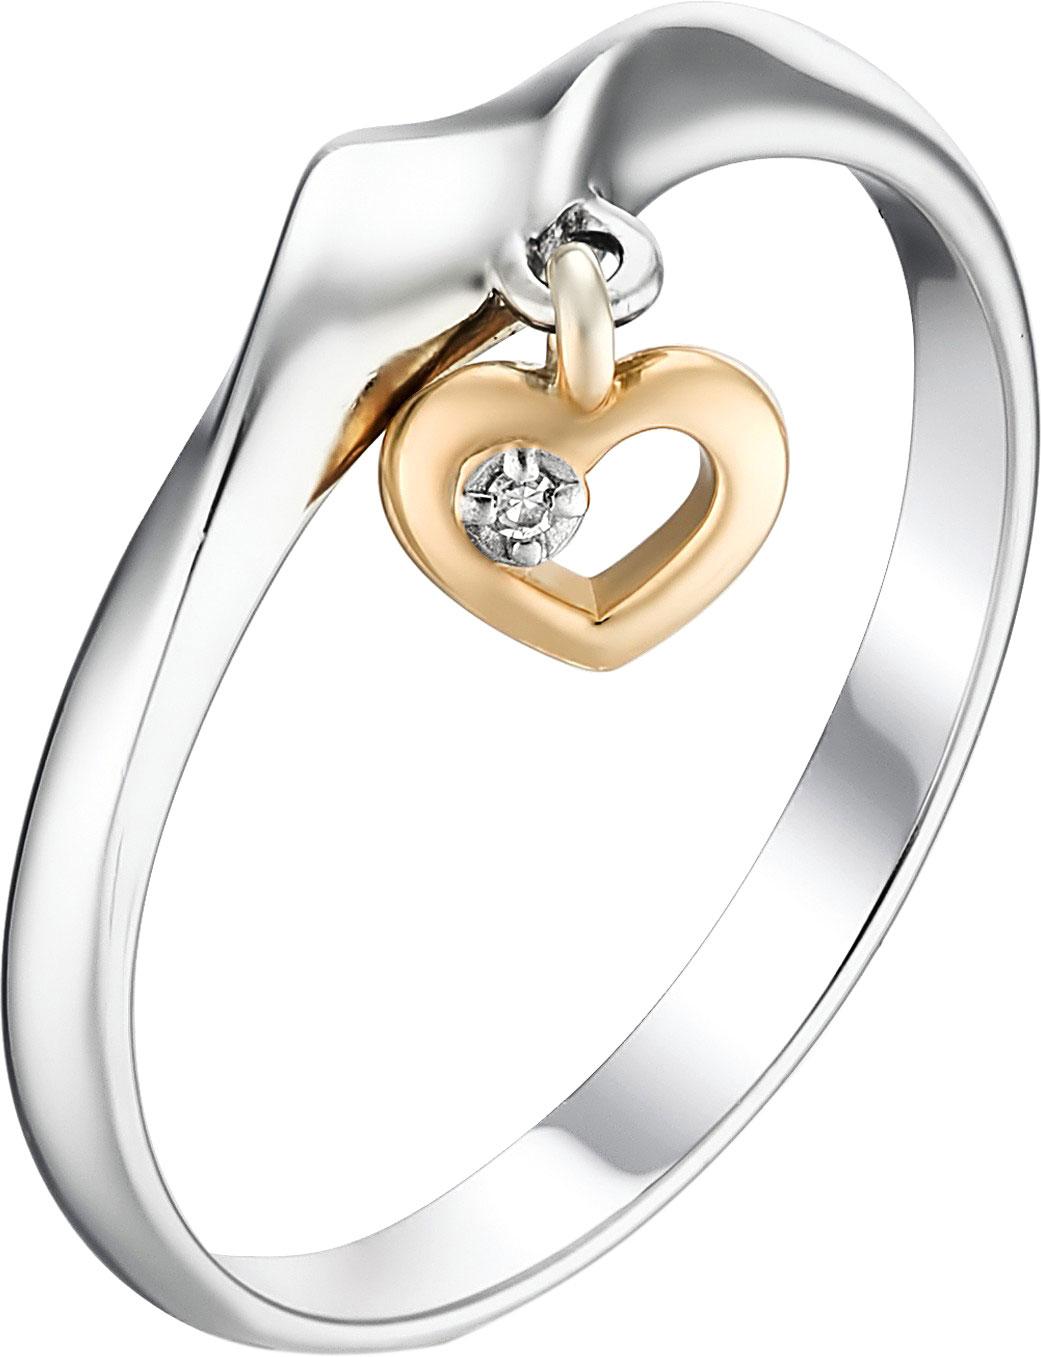 Кольца Алькор 01-1256/001B-00